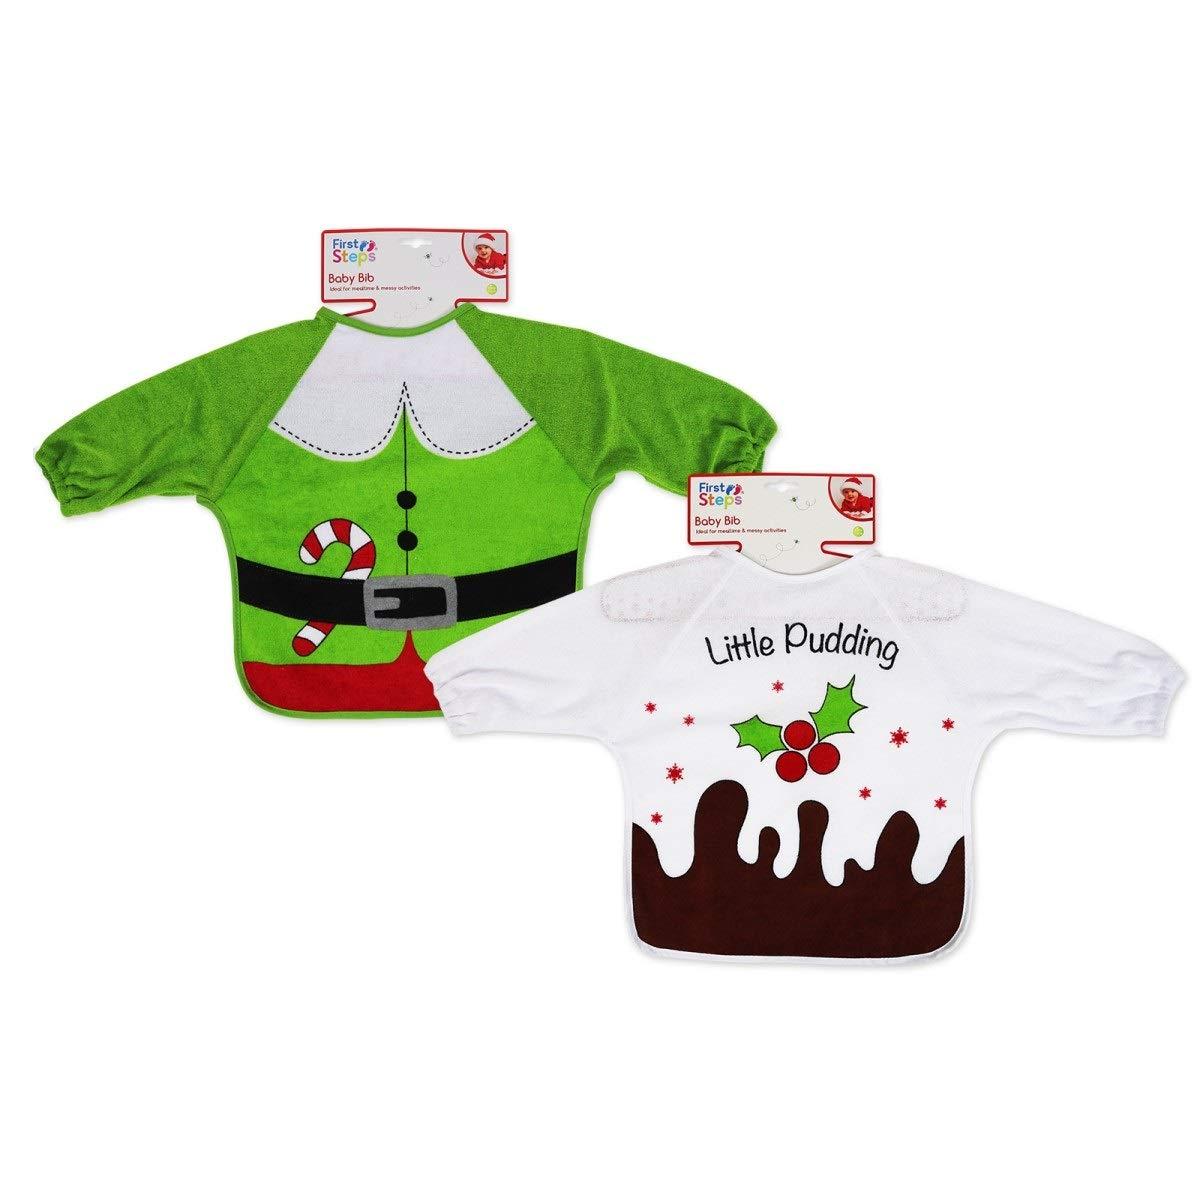 Christmas Baby PEVA Bibs Long Sleeve Boy Girl Elf and Pudding (Elf & Pudding) PinkBlueWhite